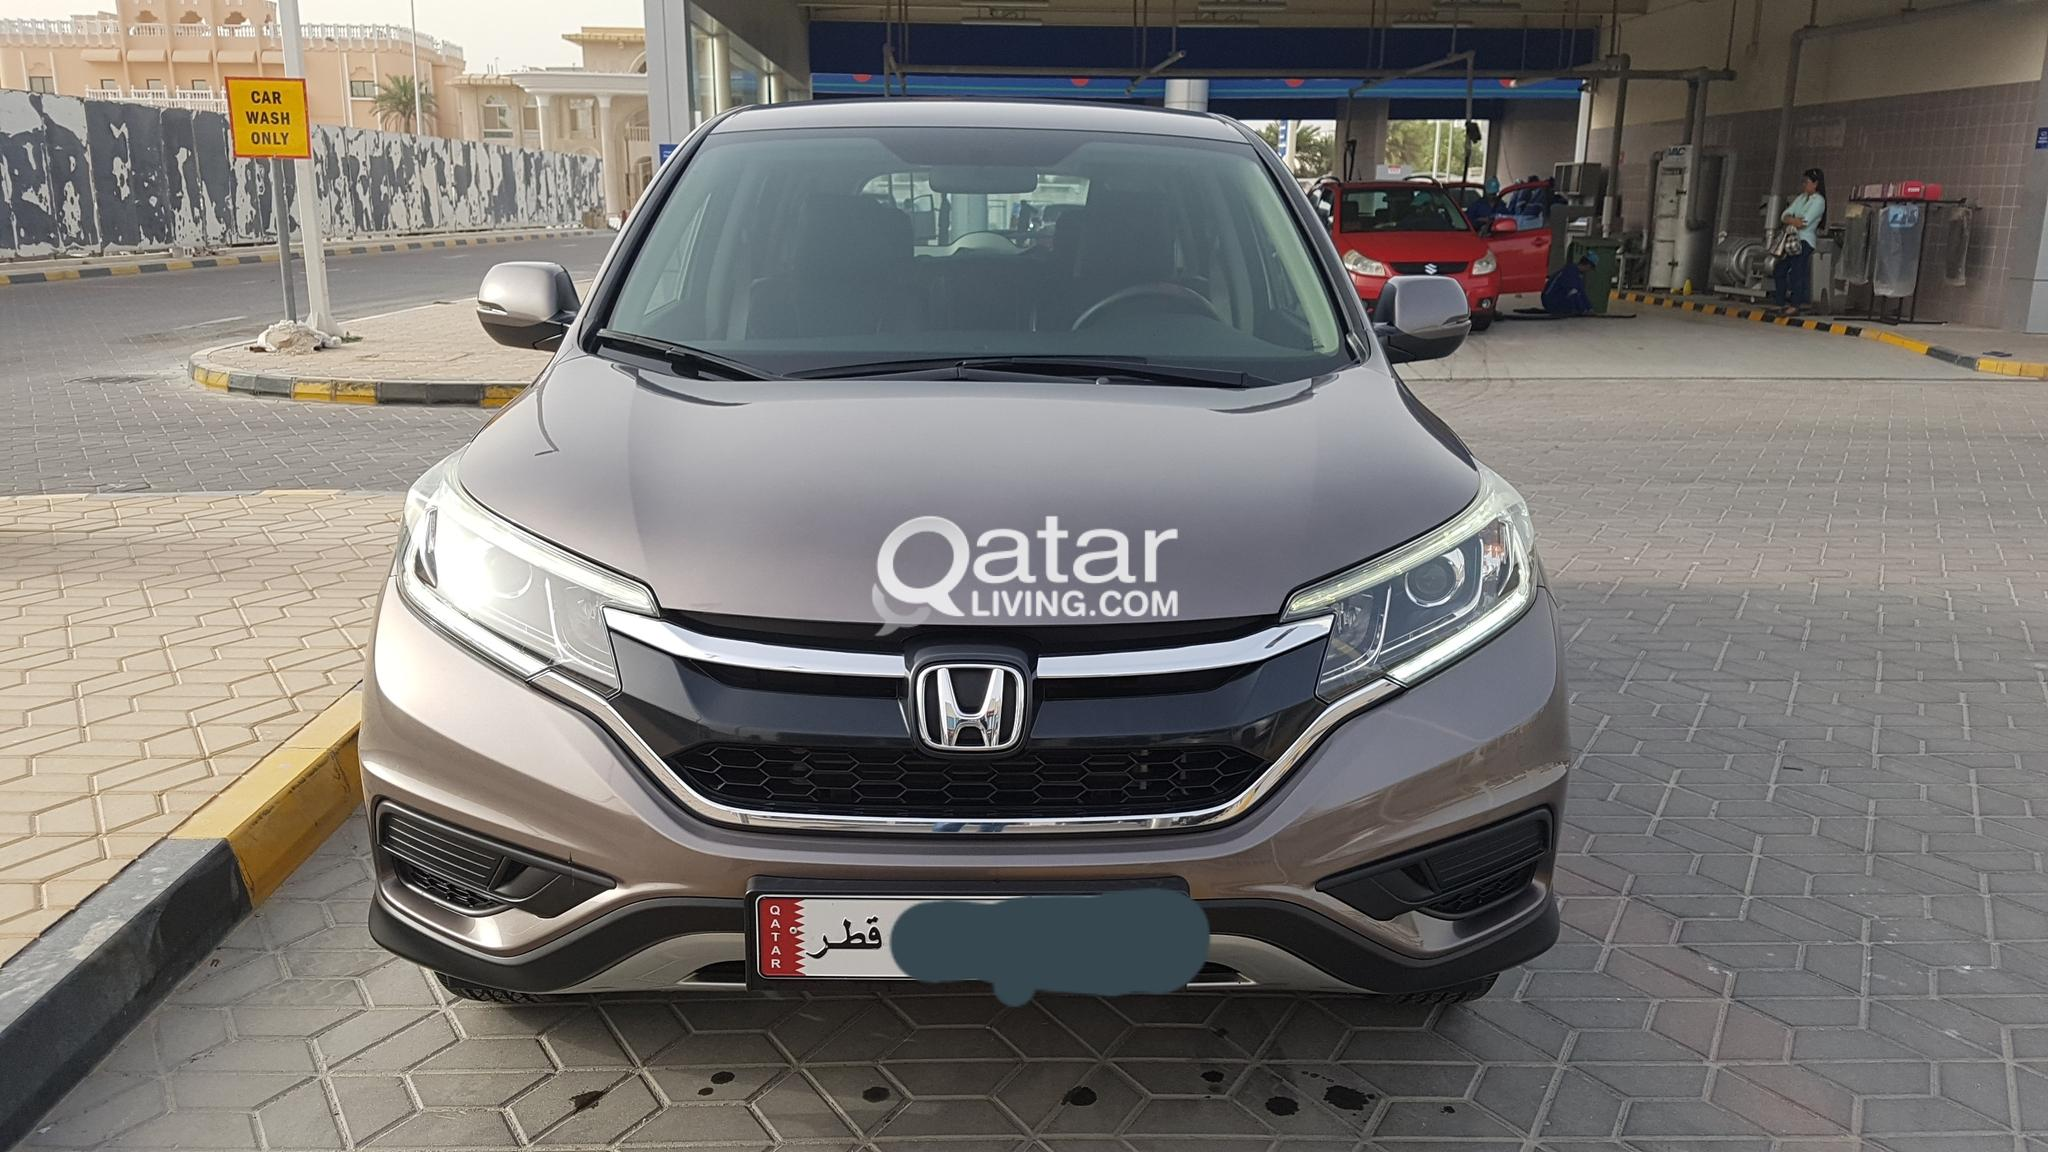 Honda Crv 2015 Qatar Living